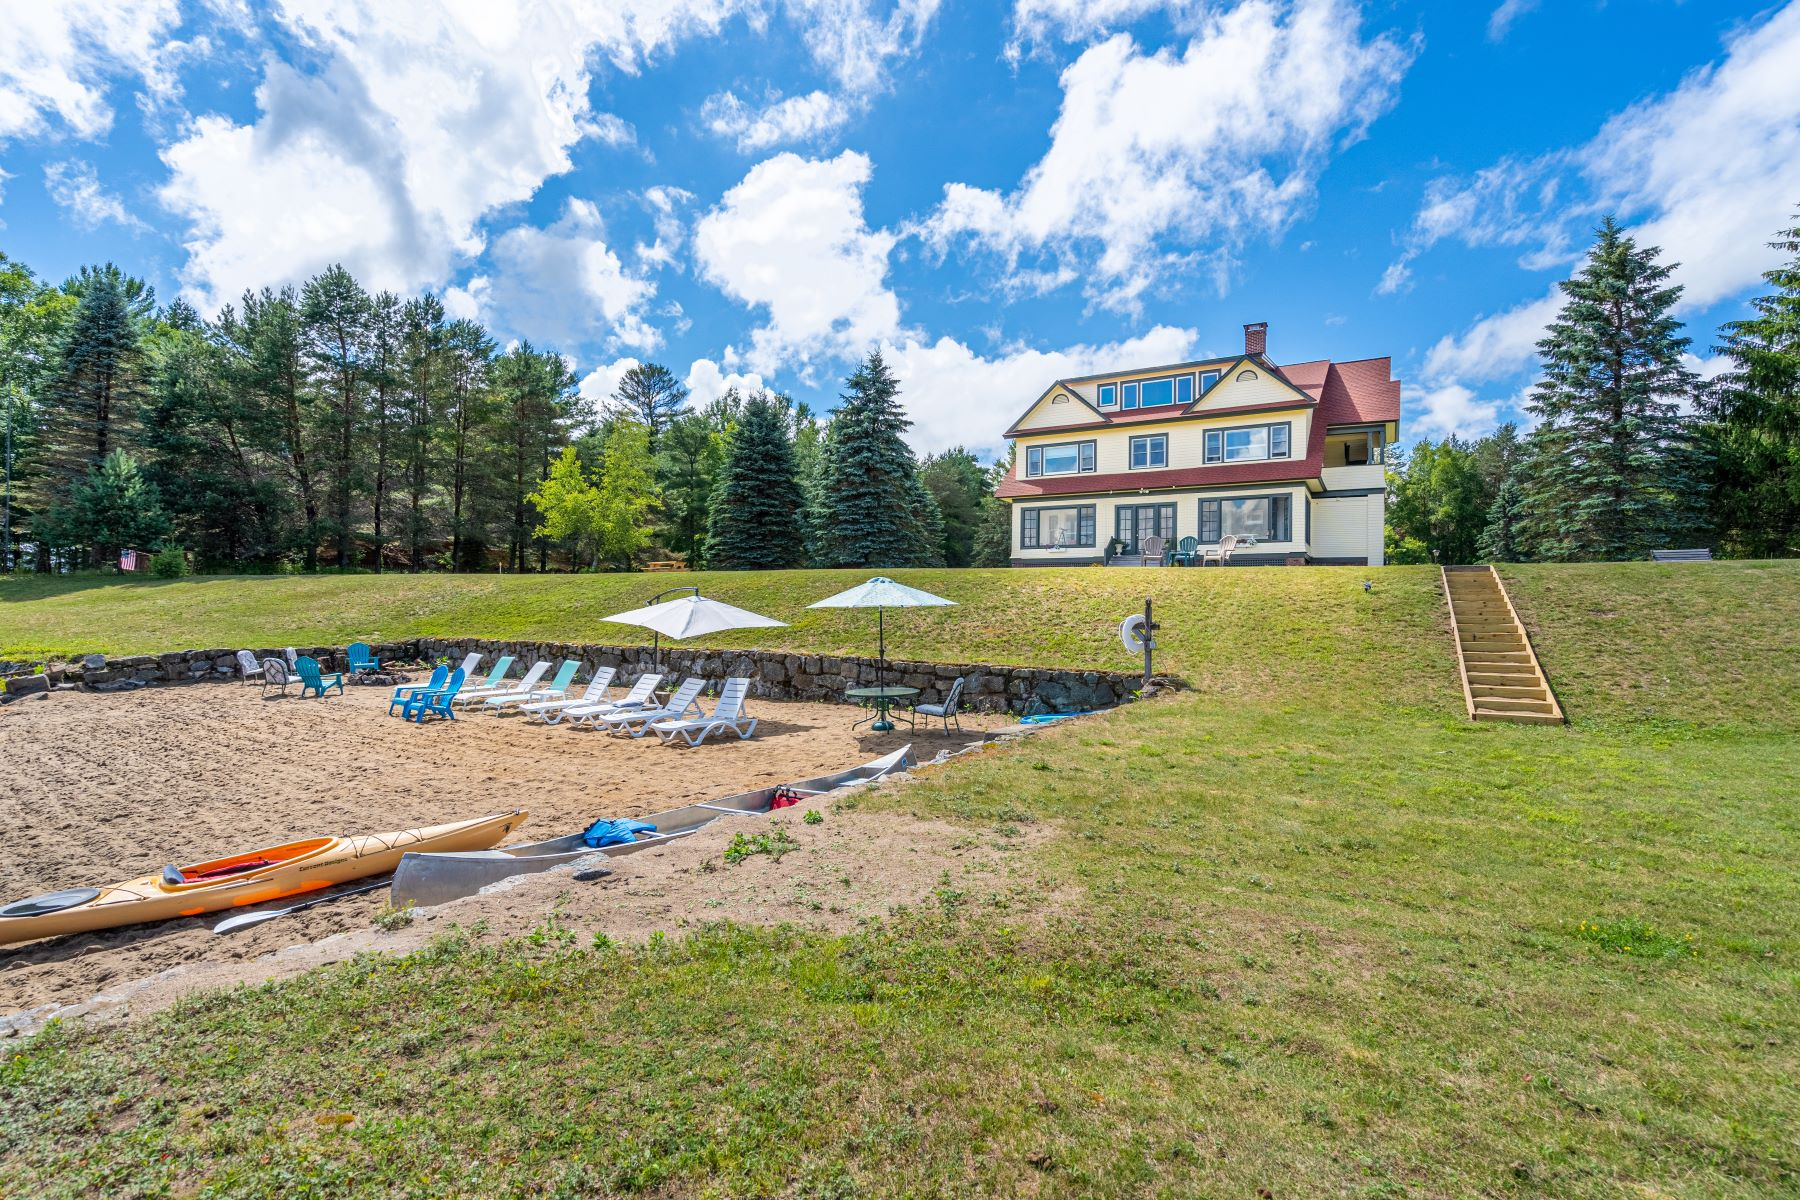 Single Family Homes for Active at The View! Riddle Cottage on Upper Saranac Lake 84 Saranac Inn Lane Saranac Lake, New York 12983 United States